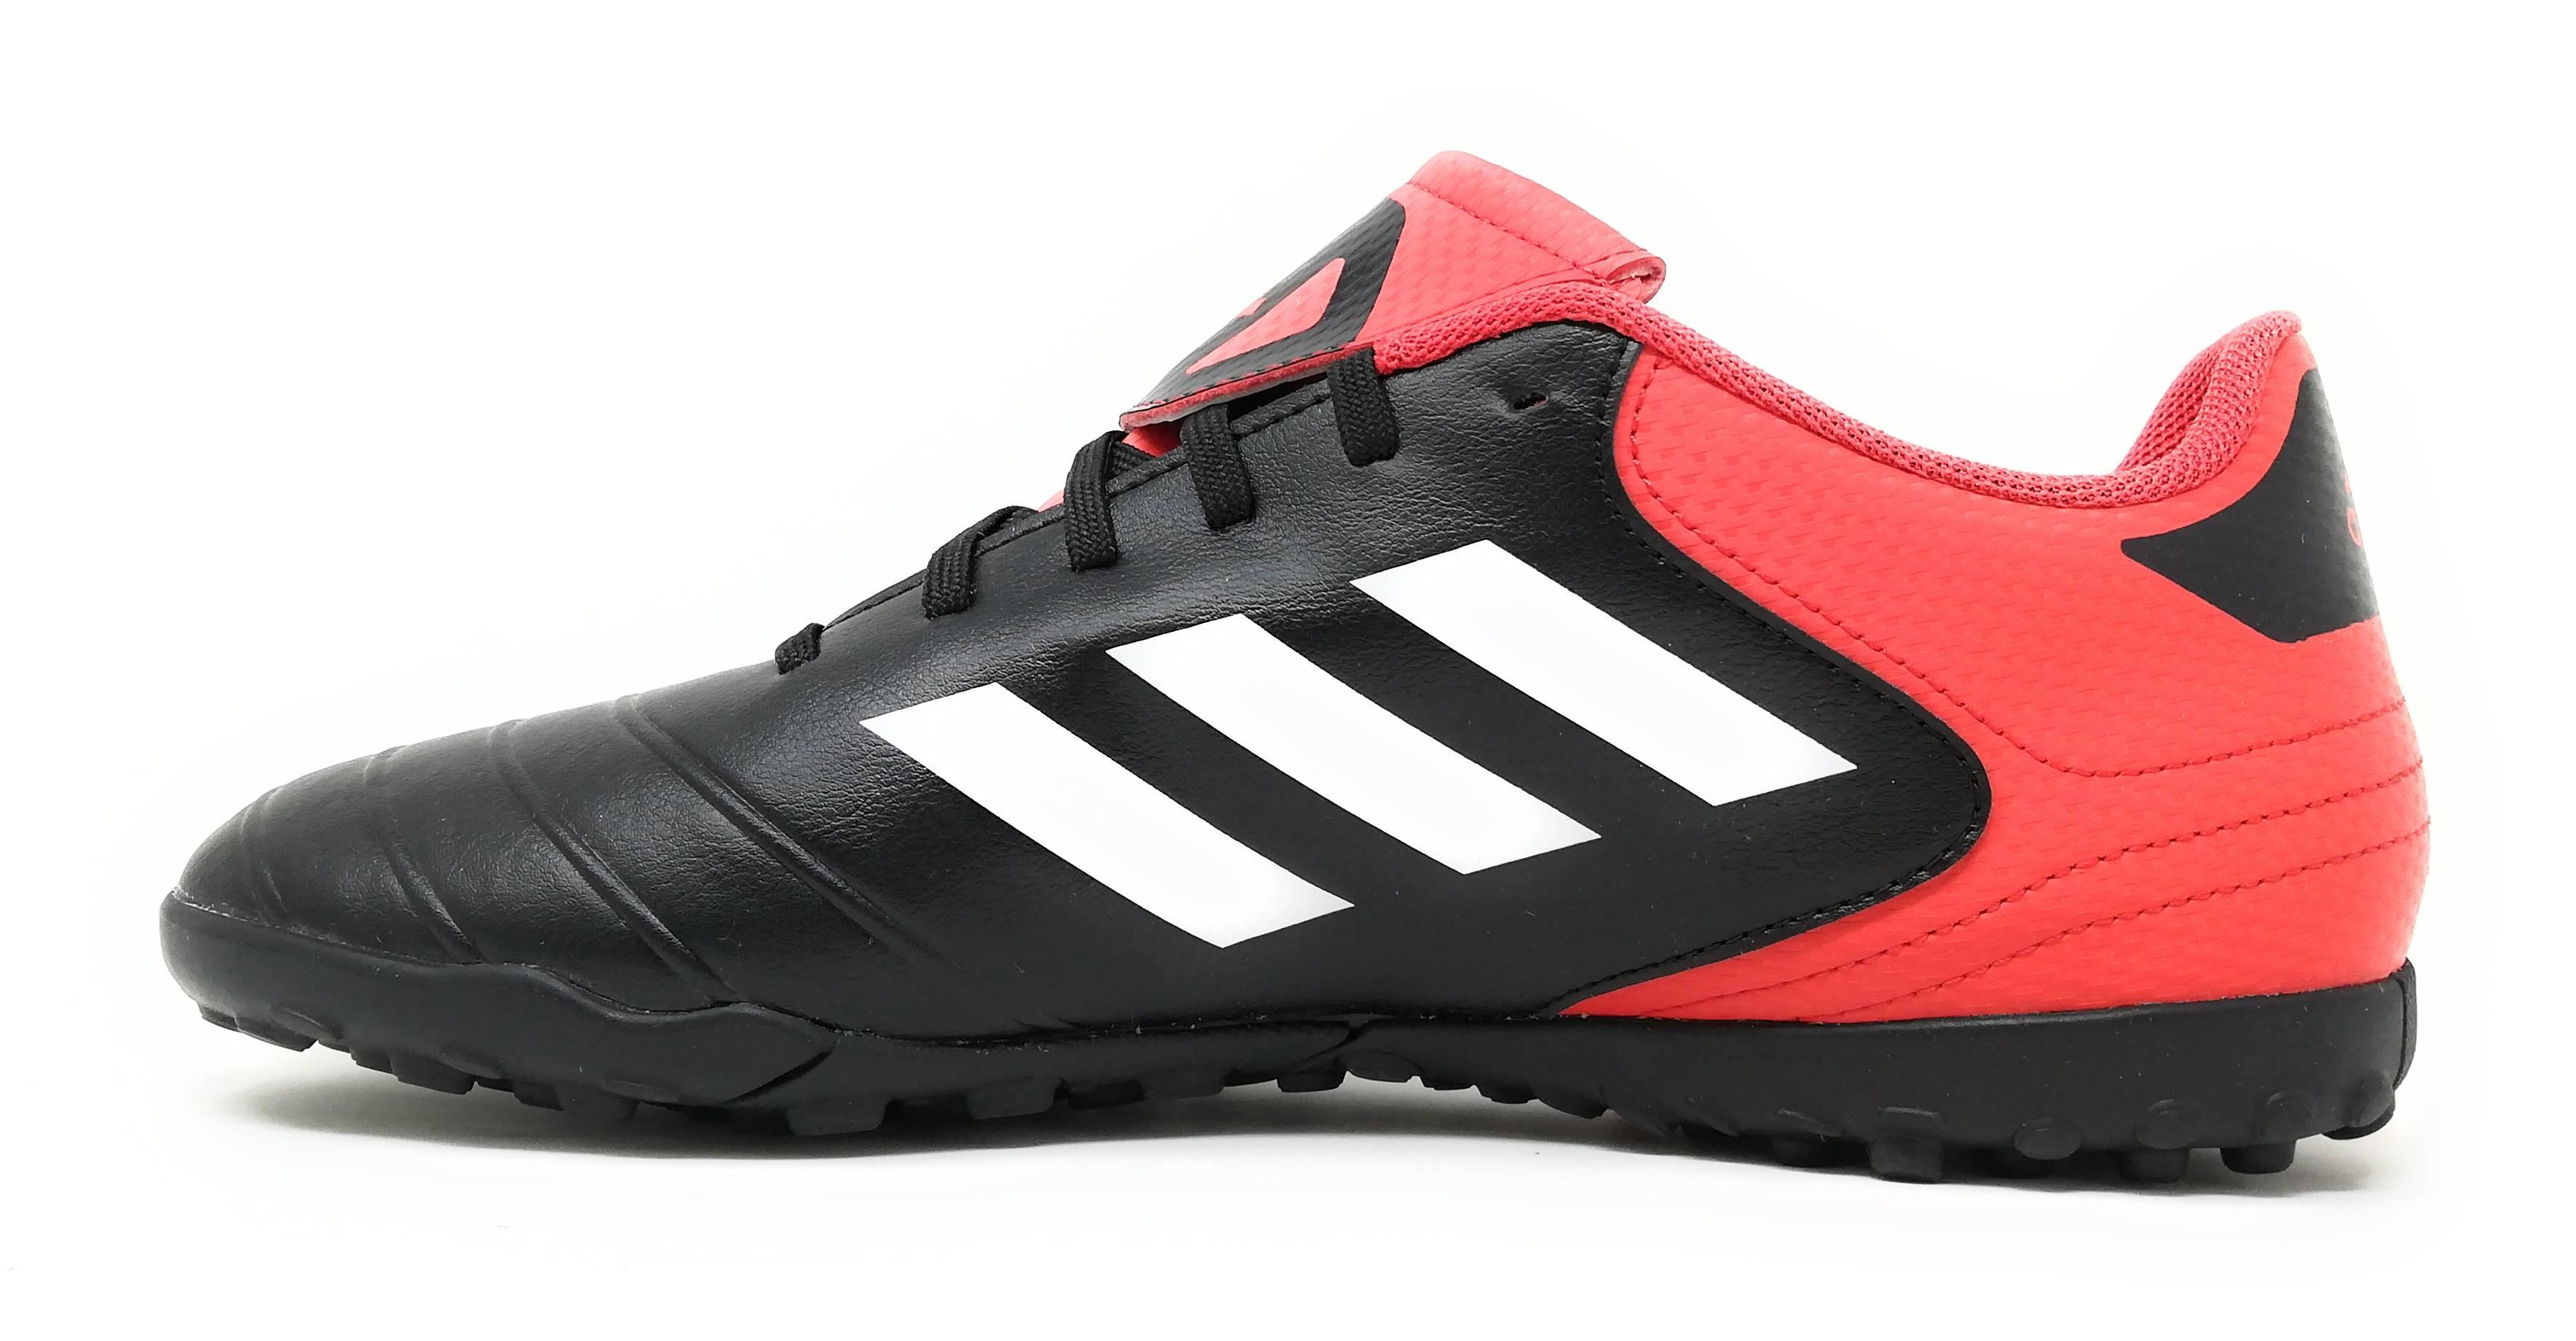 Copa Da Eu Calcio 42 Tango mqm Tf Nero Scarpe Uomo 18 Adidas 23 4 1S6qxIwg